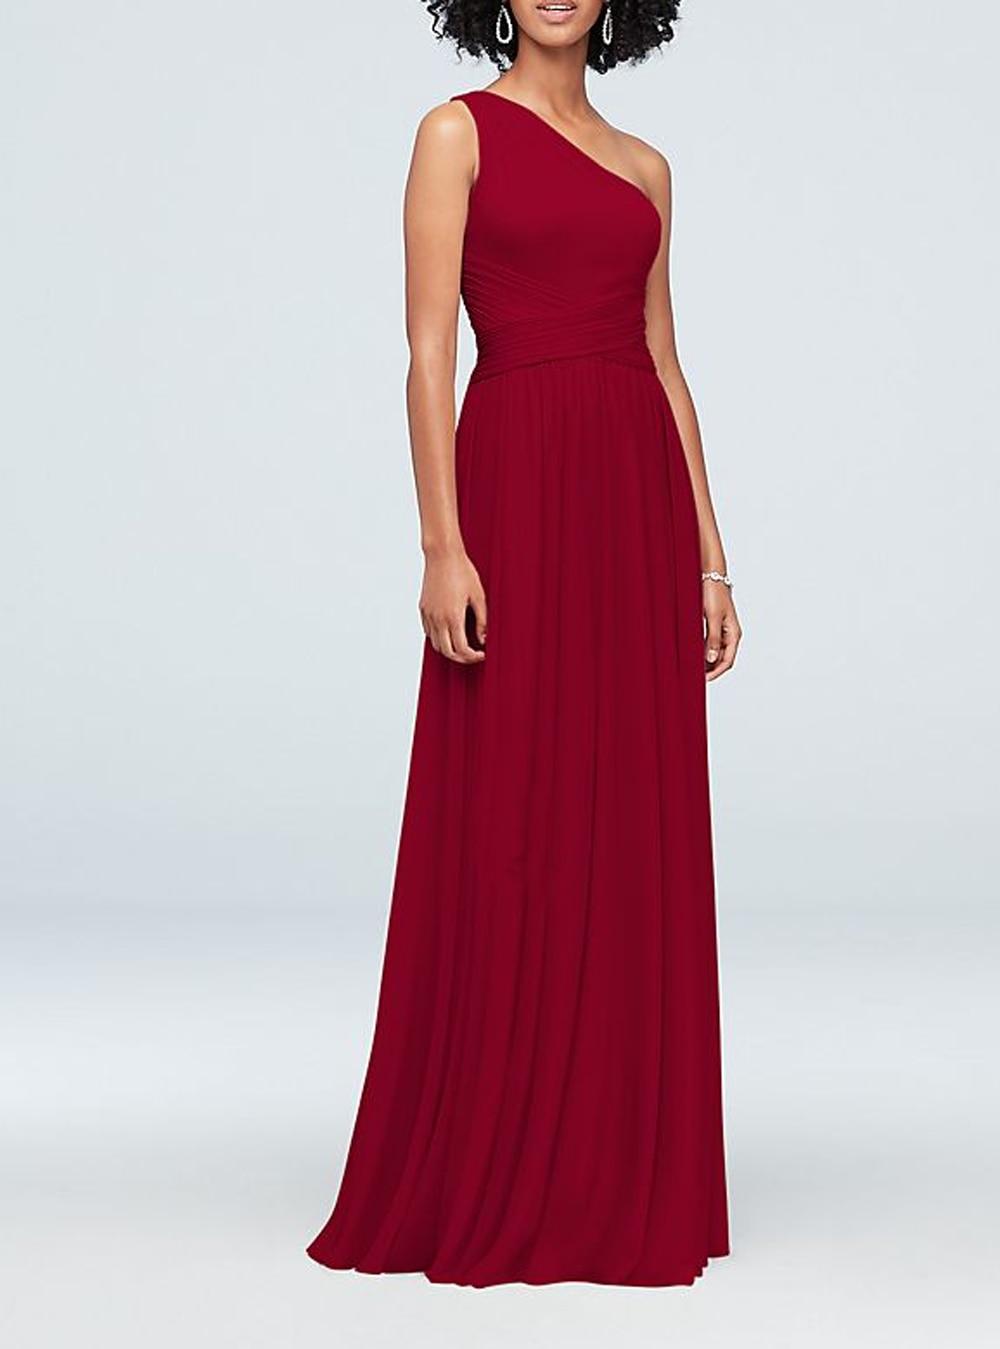 One shoulder Sleeveless Sweep train Burgundy Bridesmaid Dresses Pleat Chiffon Party Dresses